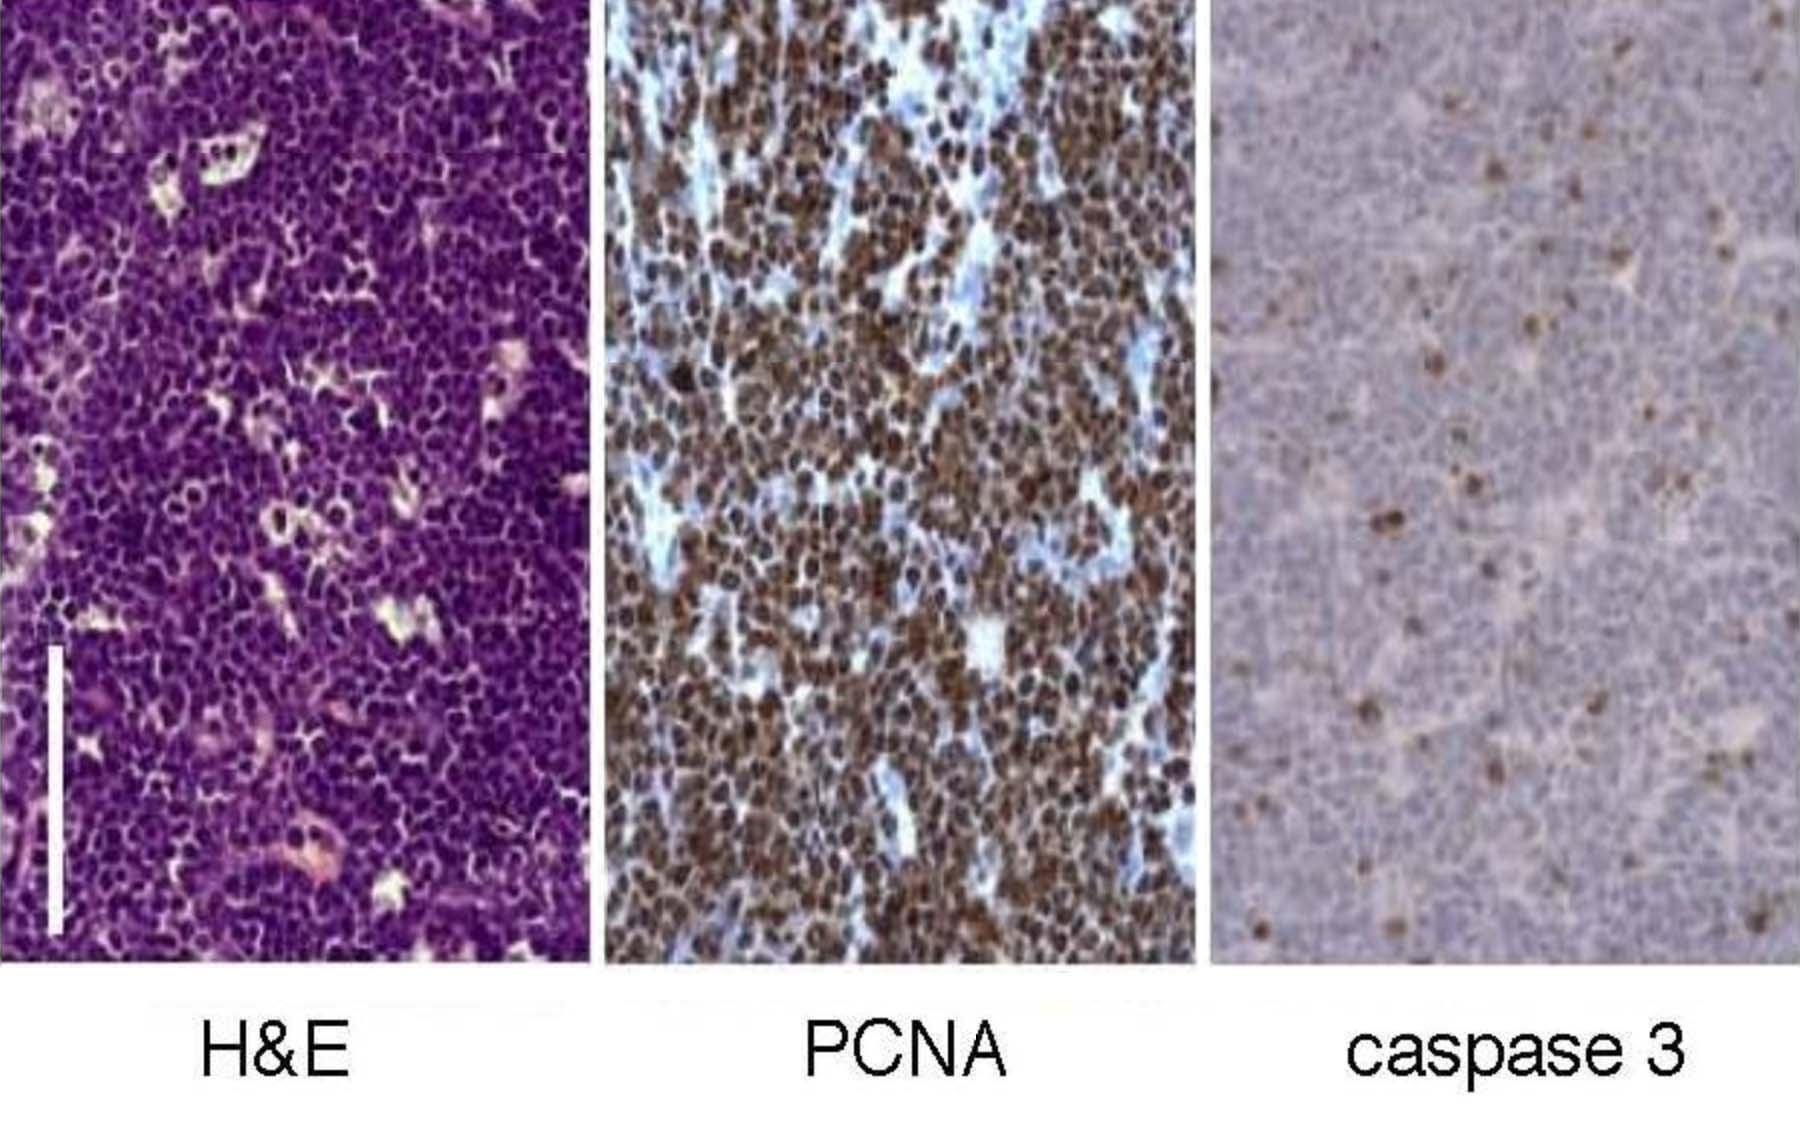 RNAi in vivo lymphoma model